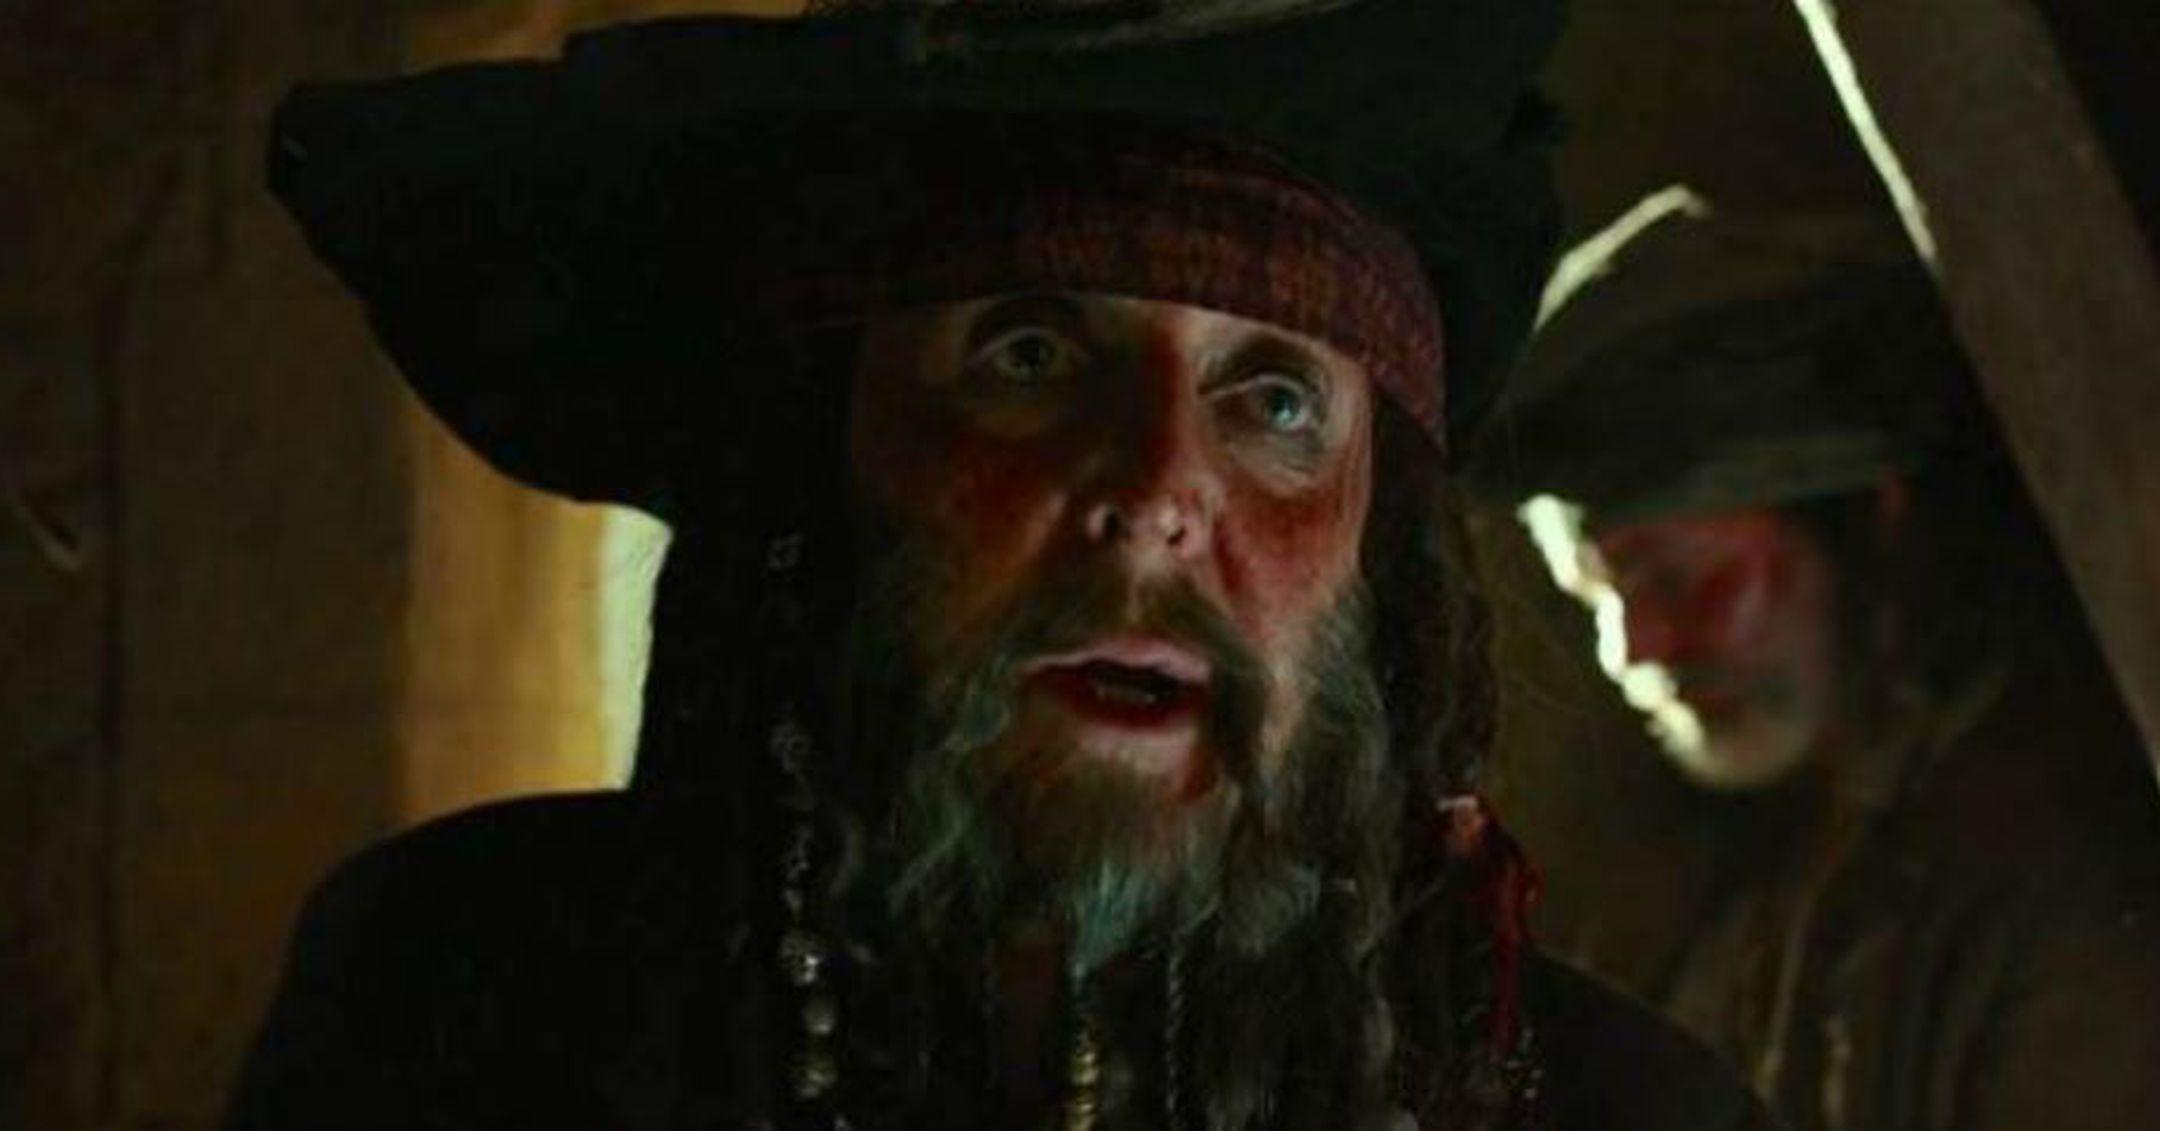 paul-mccartney-pirates-of-the-caribbean-1535070736849-1535070738694-1535122035214-1535122037150.JPG